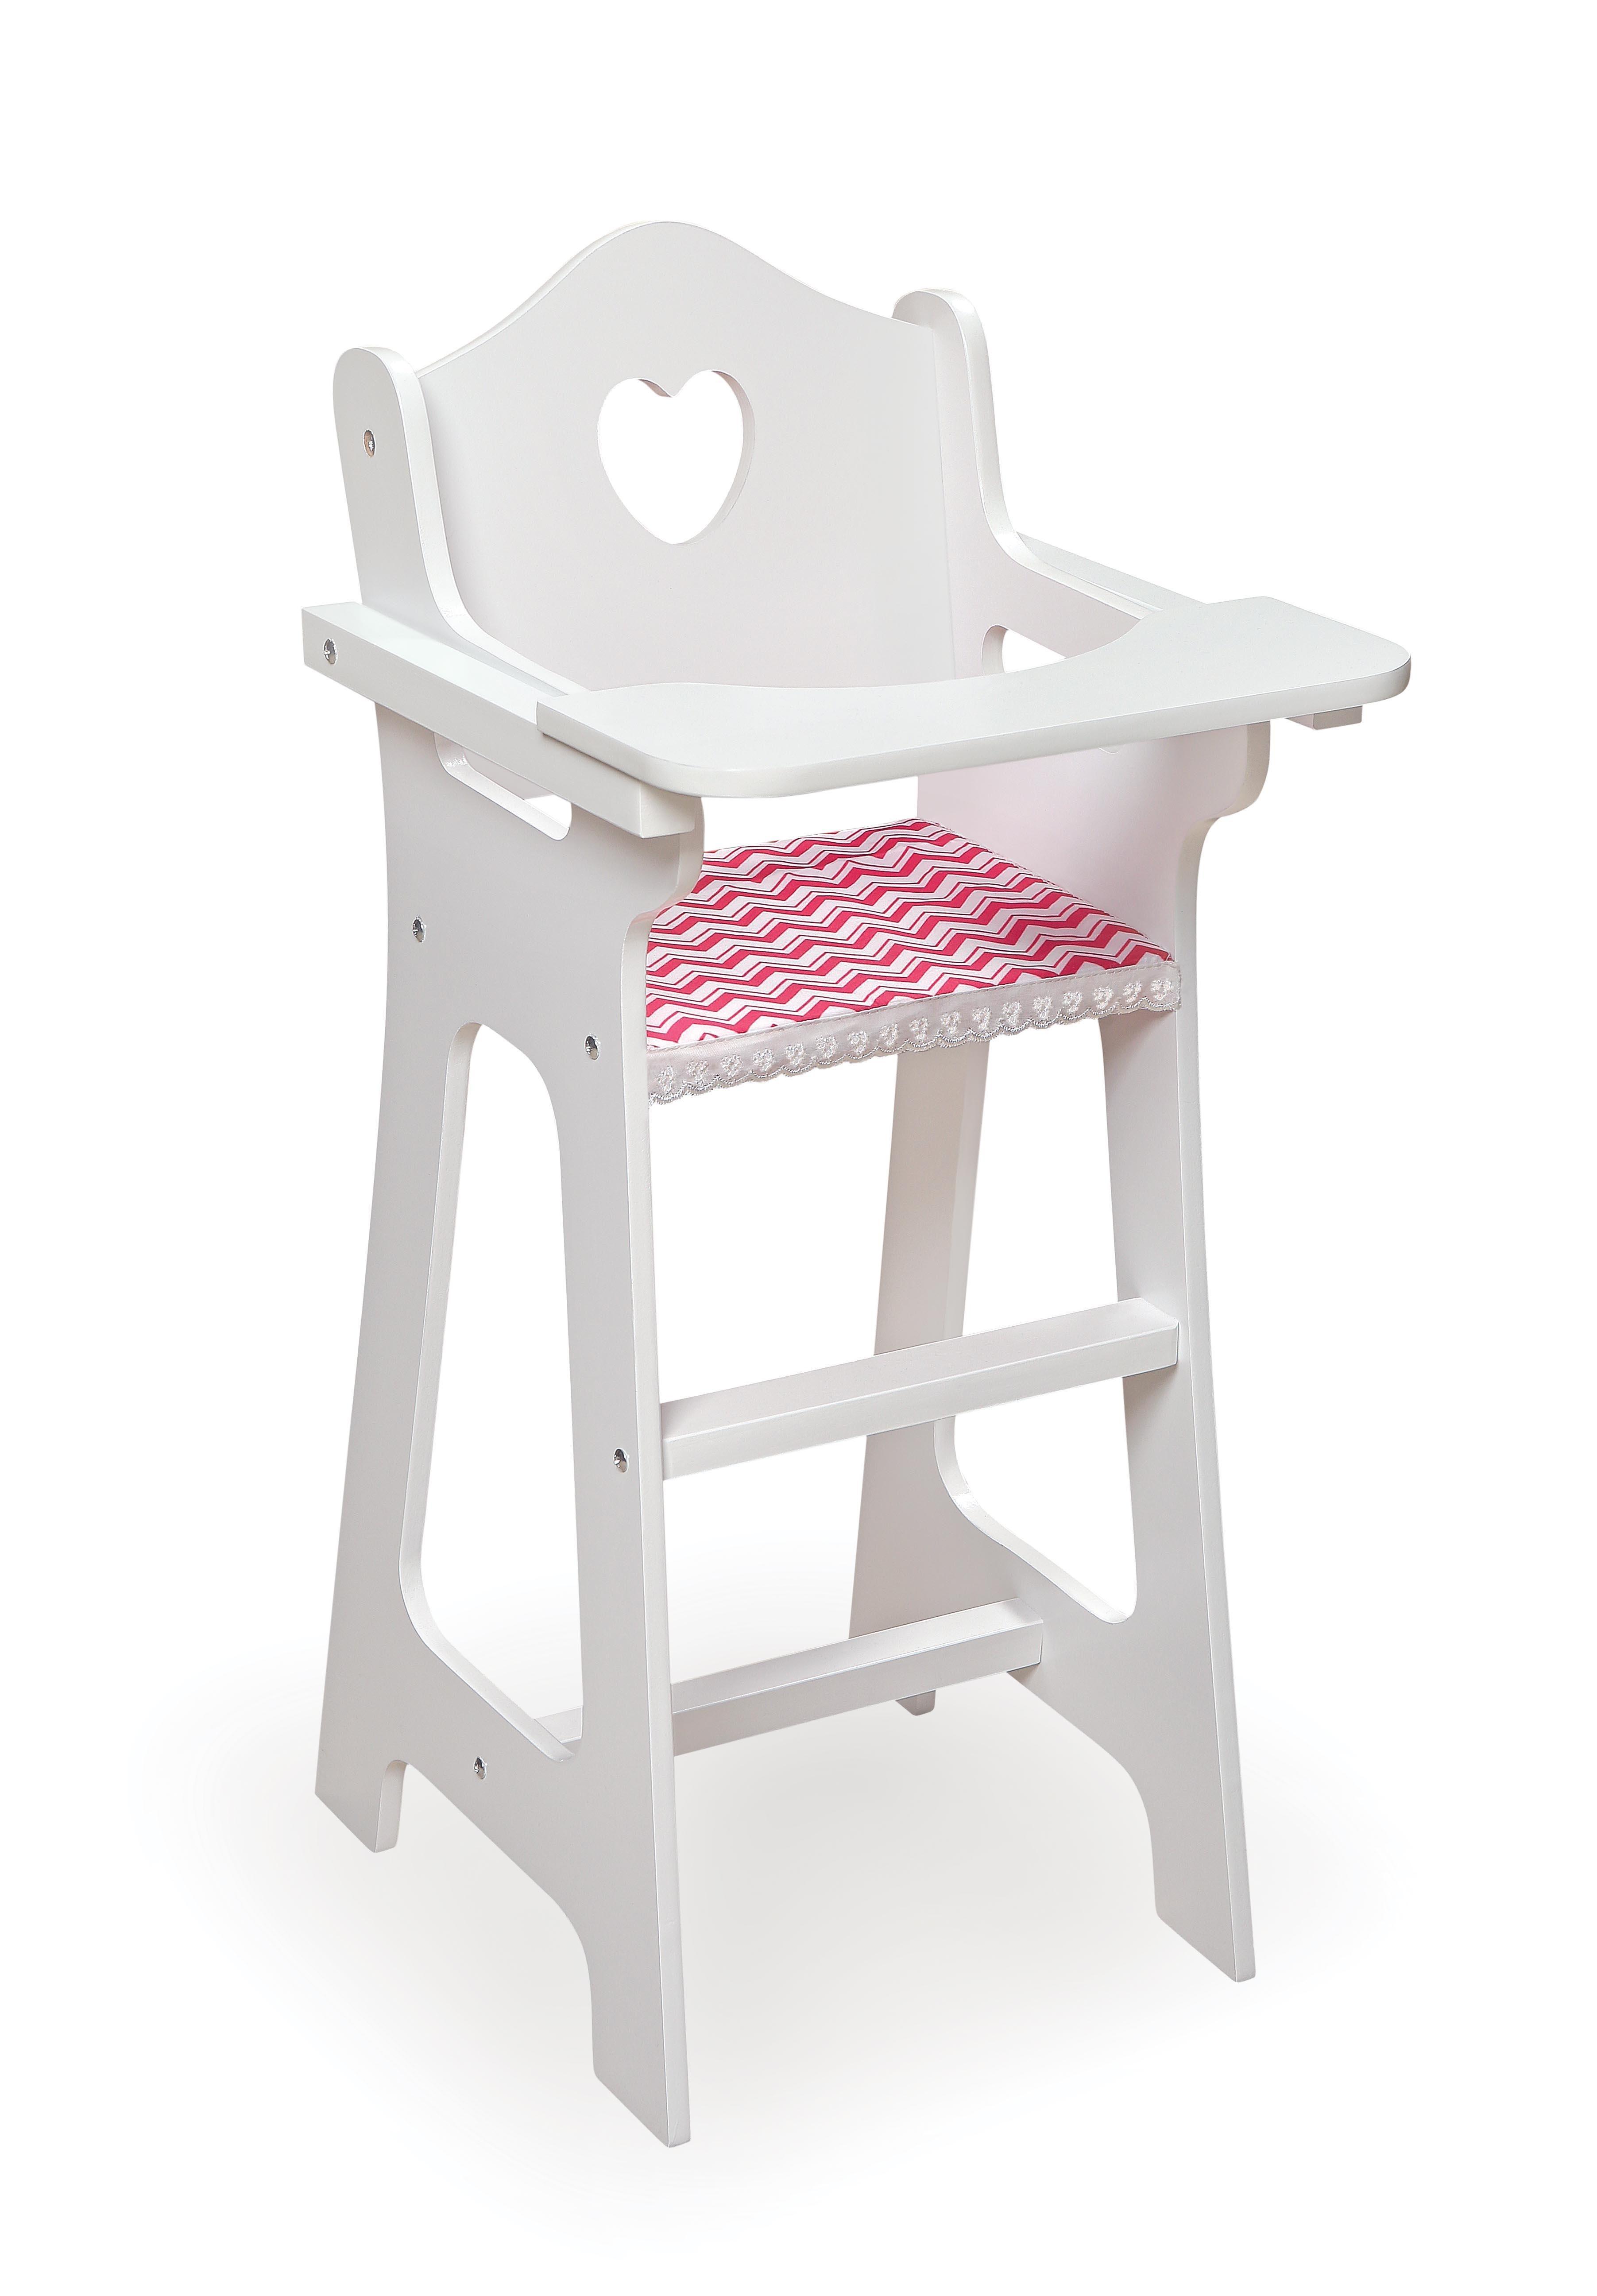 chair leg protectors for hardwood floors walmart